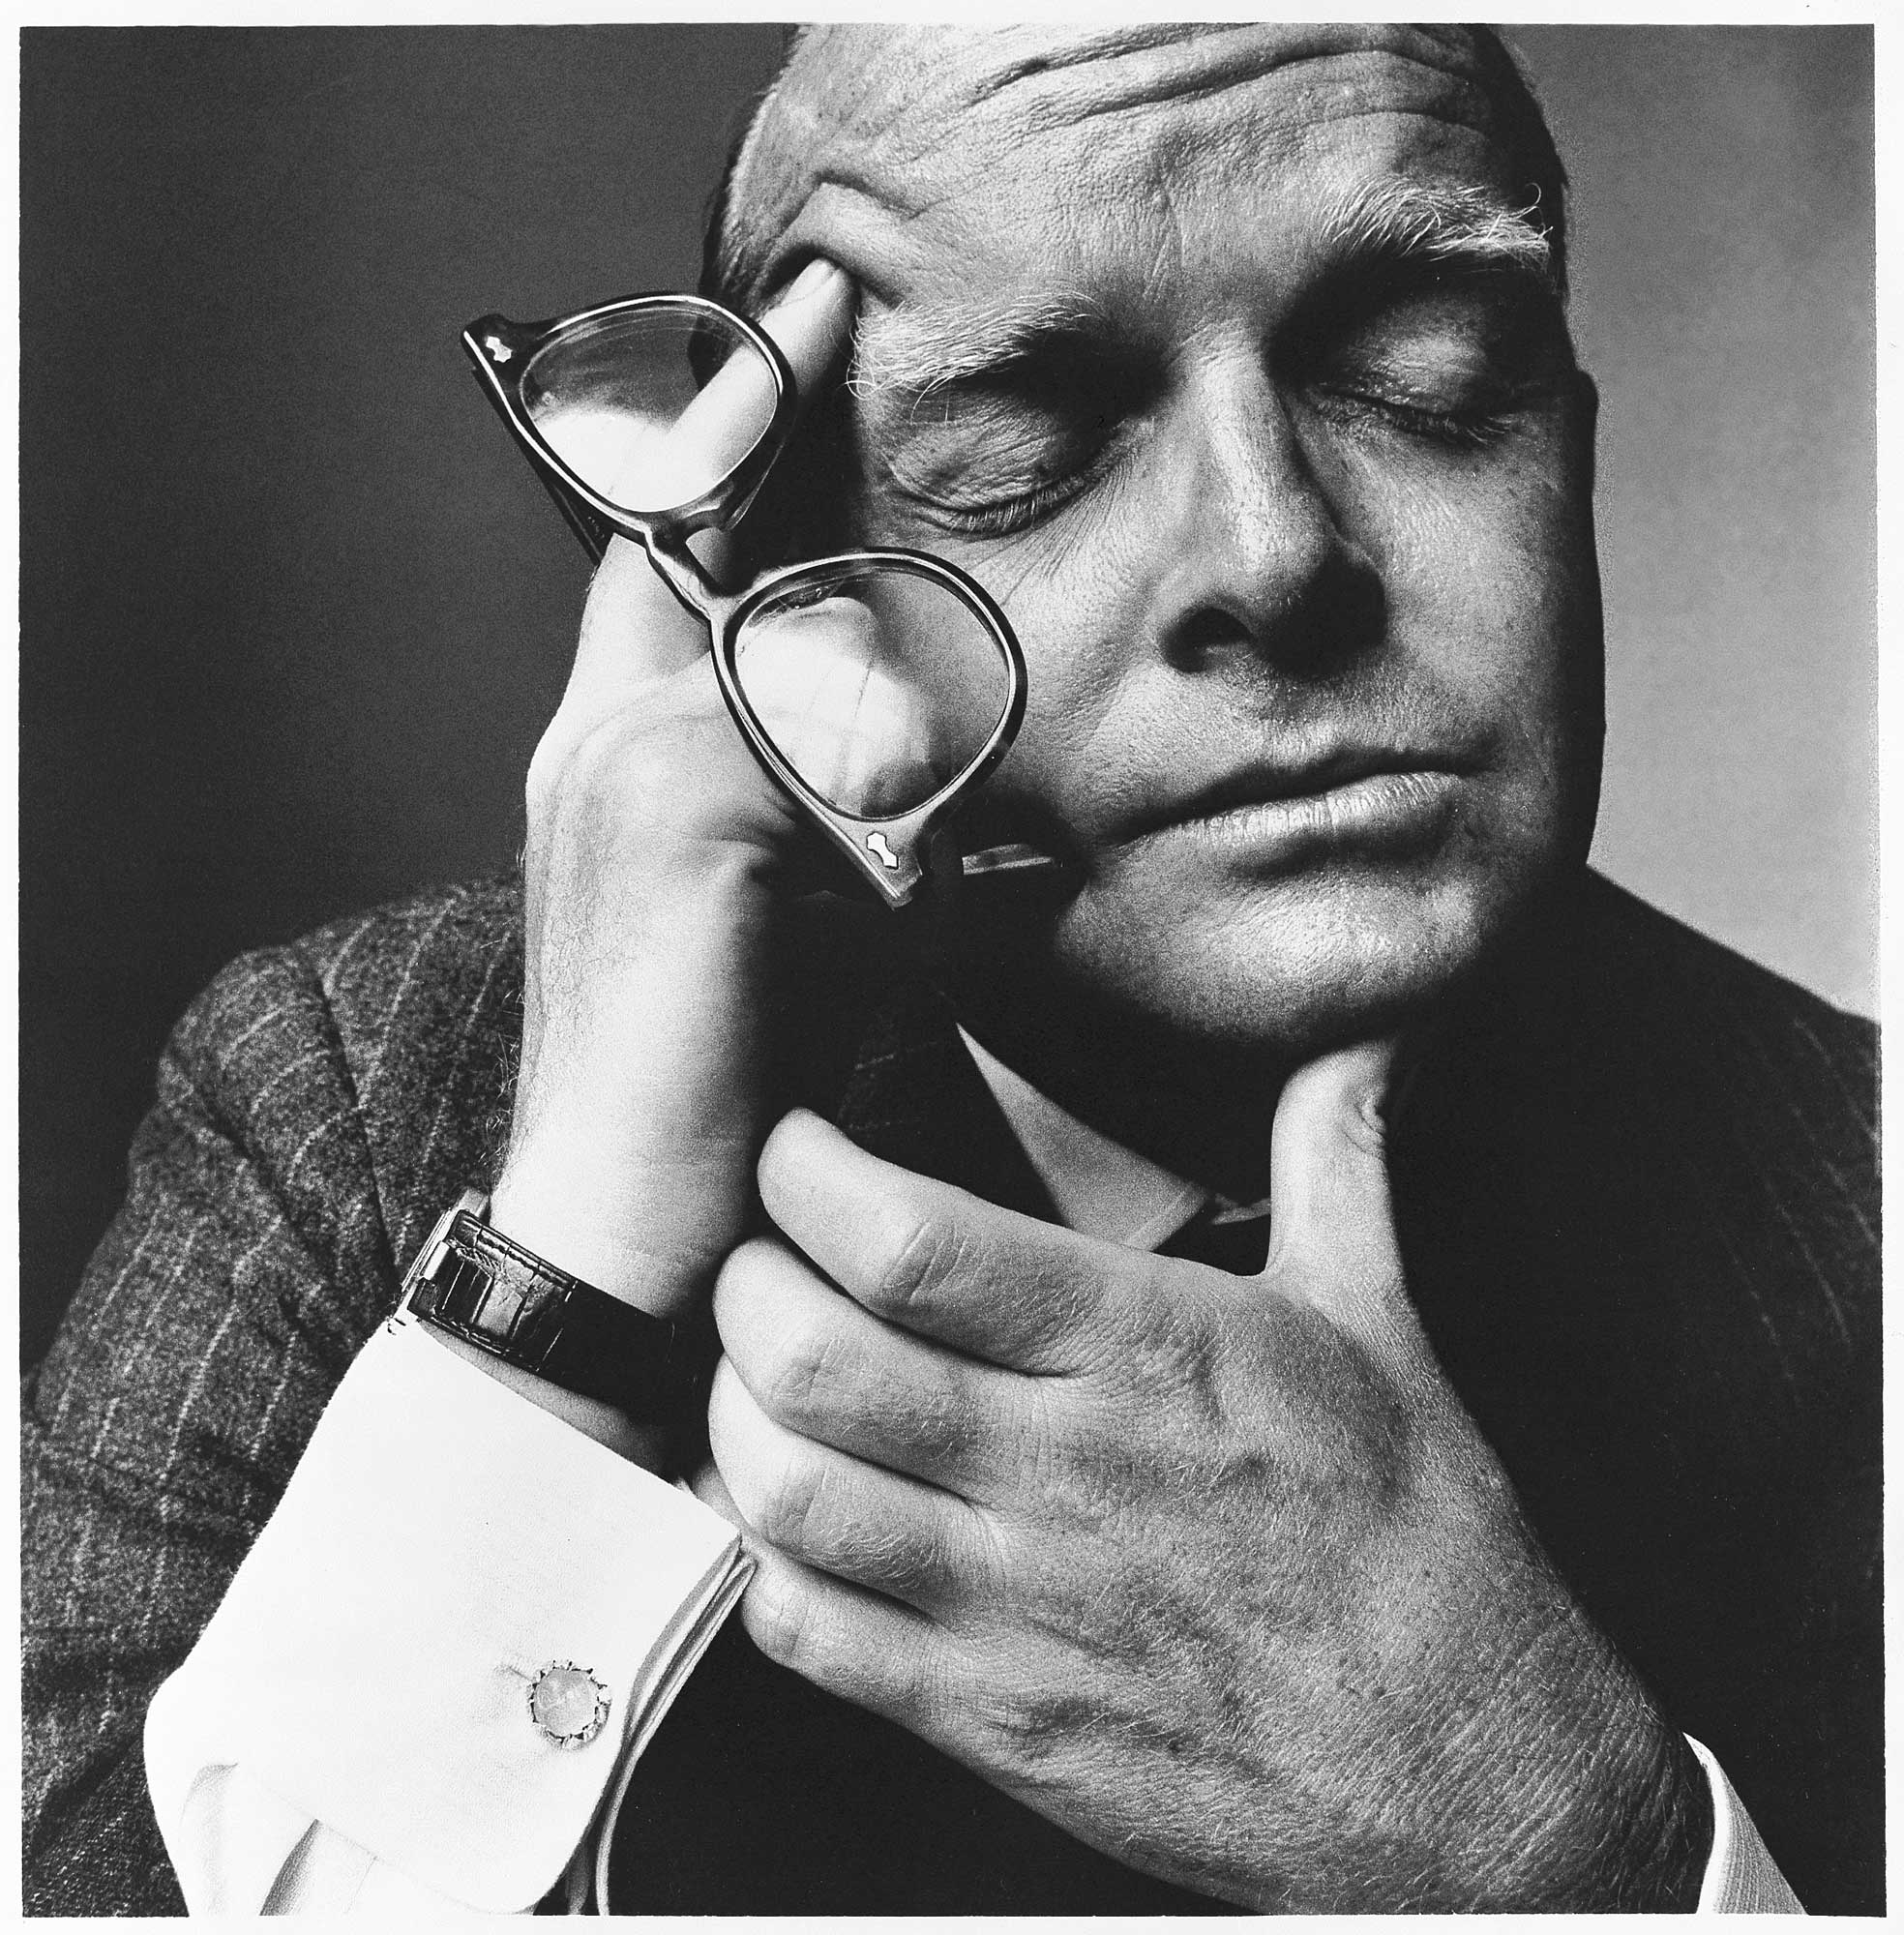 Tristeza elaborada en esta imagen de Truman Capote